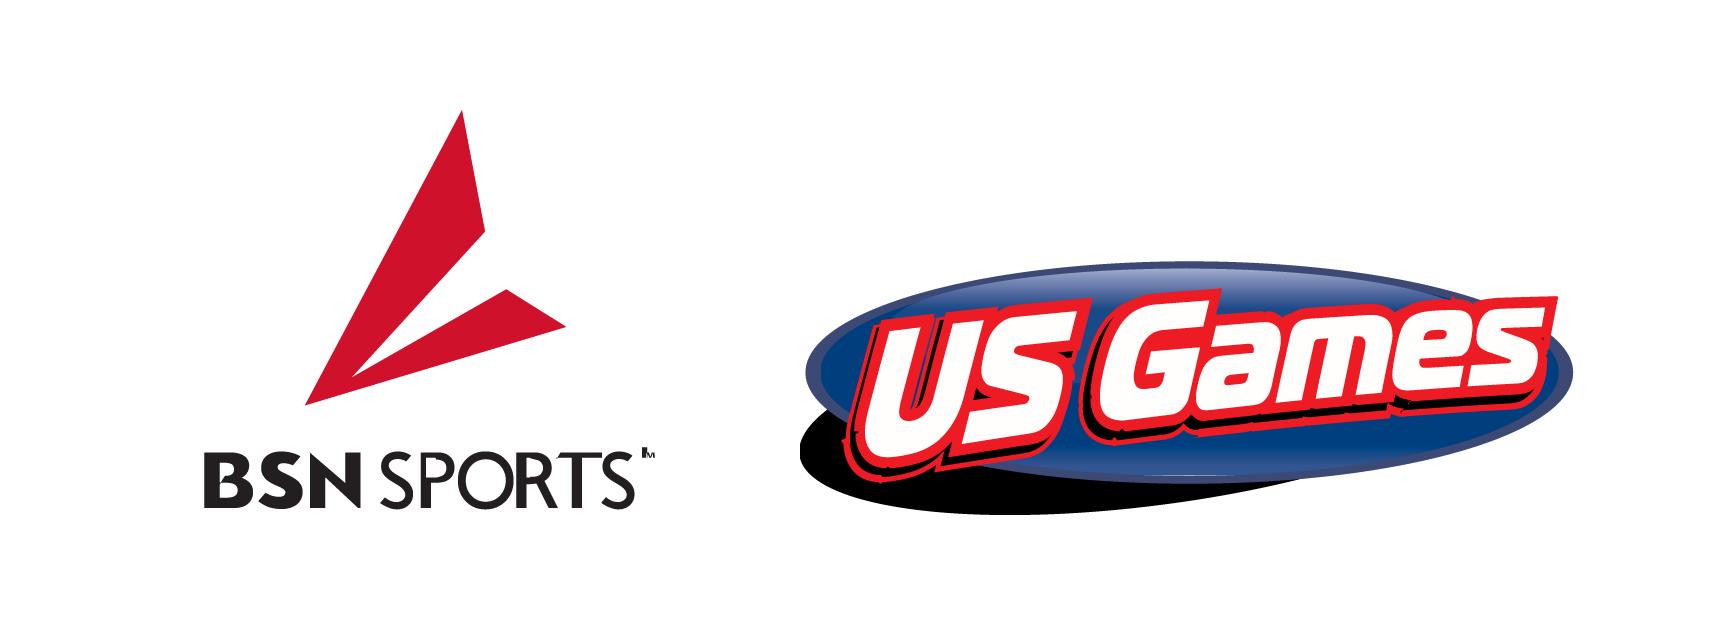 BSN Sports & US Games